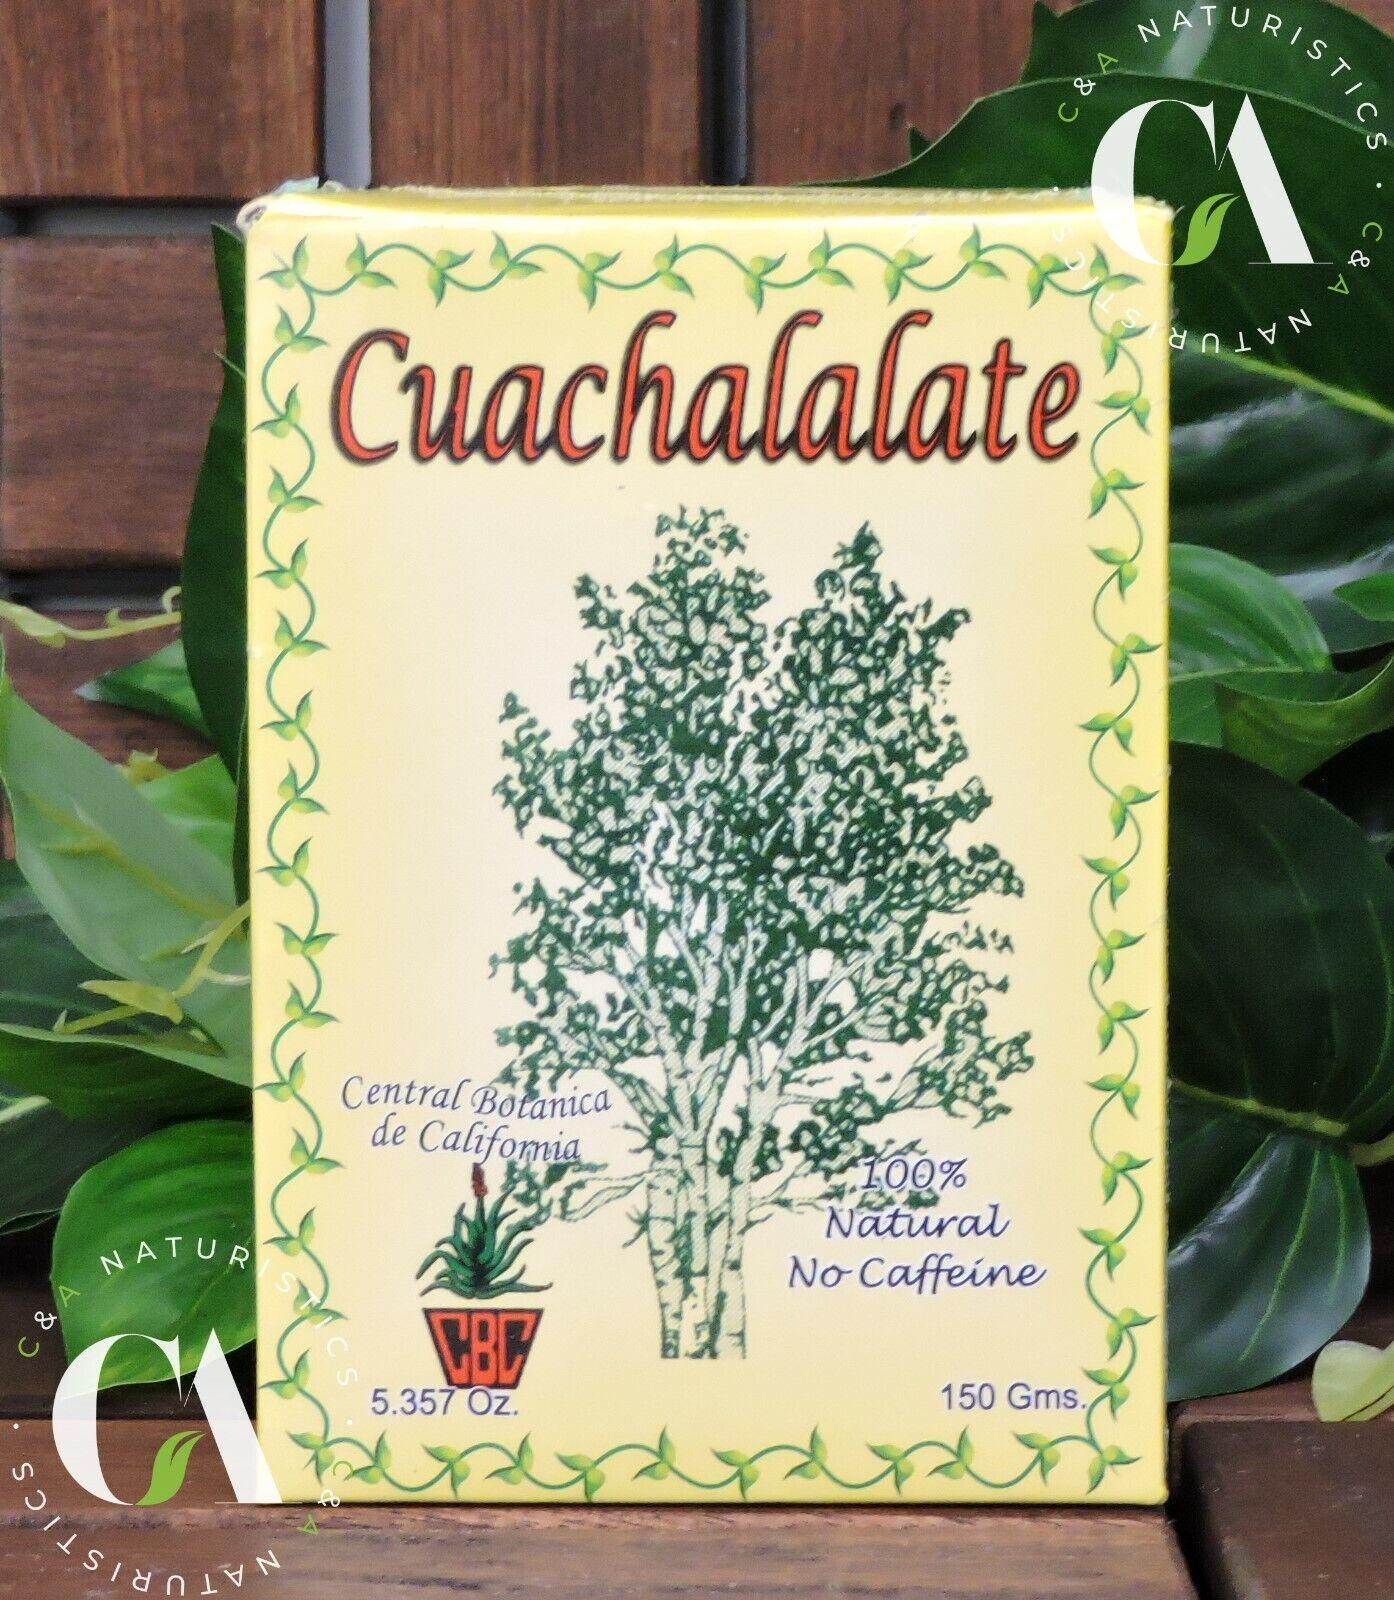 Cuachalalate Tea Agranel 100% Natural & Original No-Caffeine (5.356OZ, 150GMS)